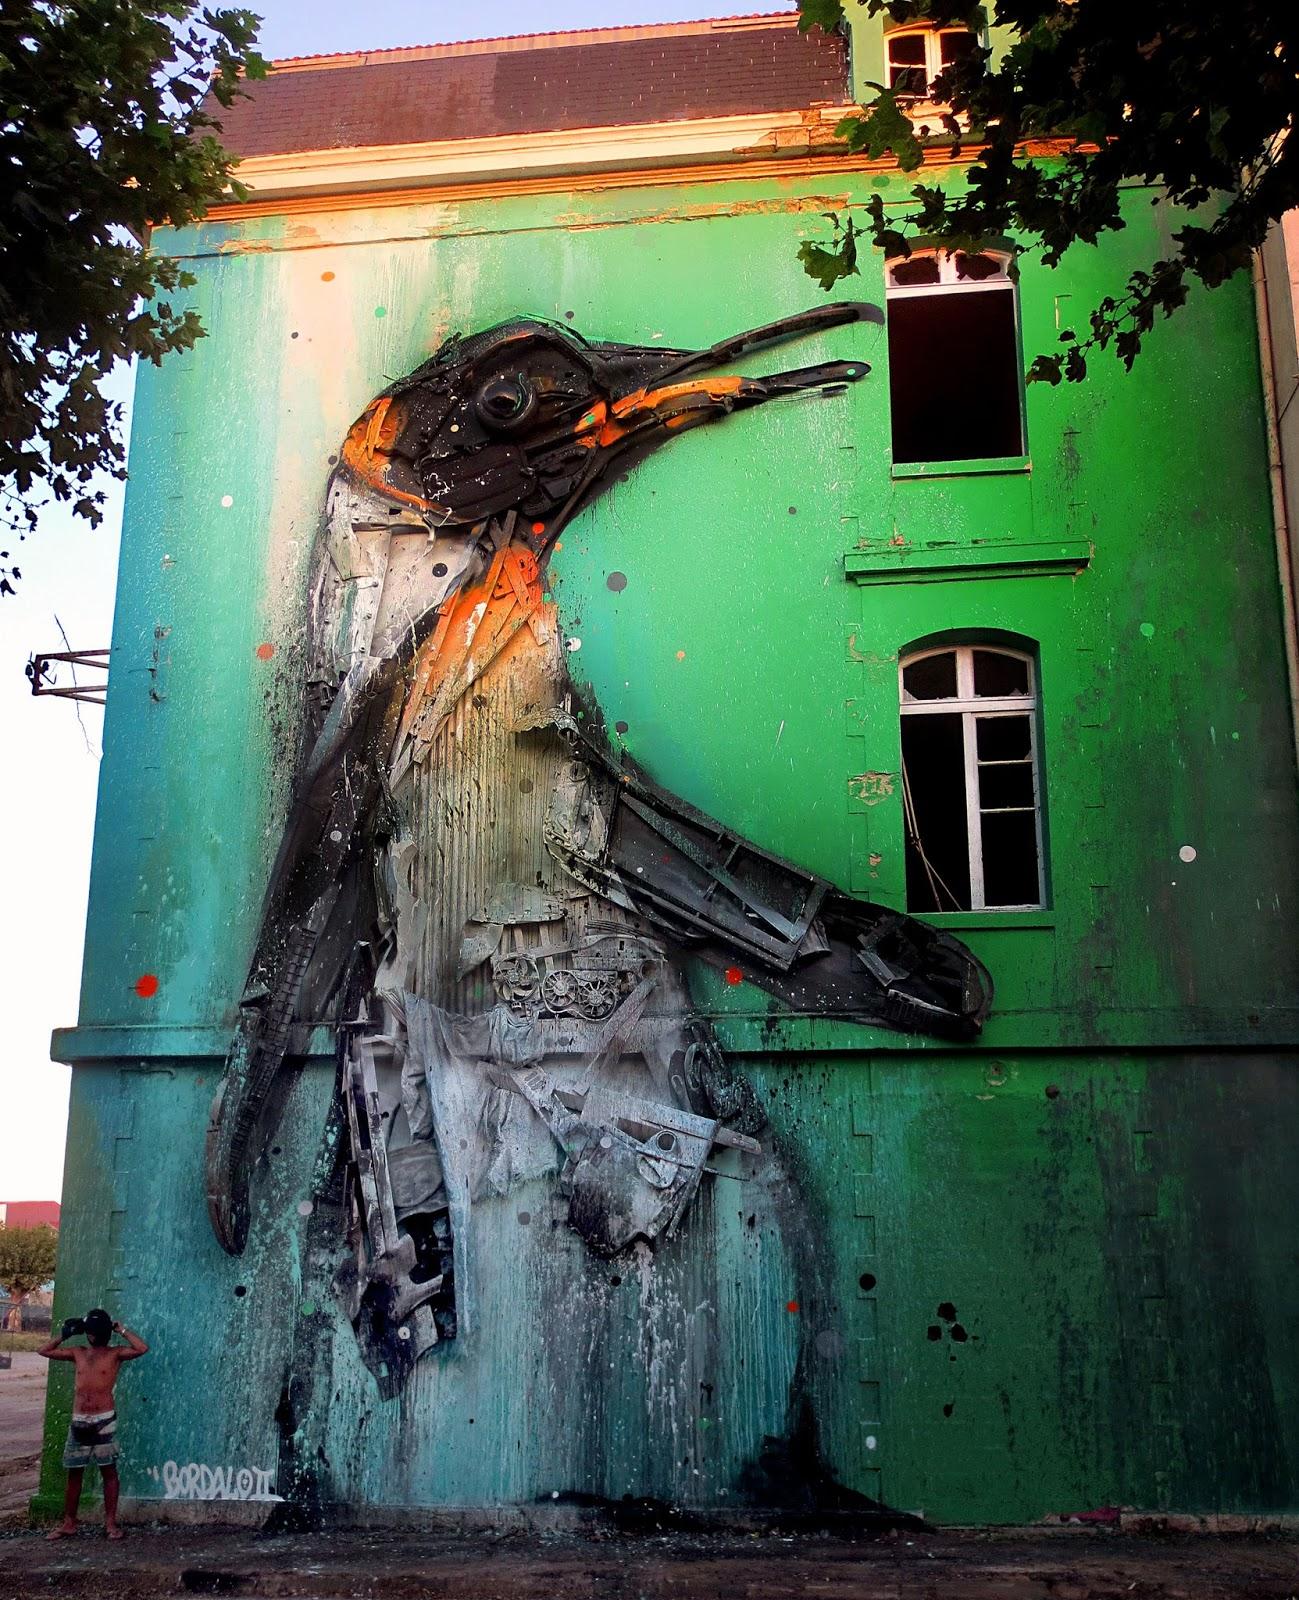 melting penguin a new mural by bordalo ii in bordeaux france streetartnews streetartnews. Black Bedroom Furniture Sets. Home Design Ideas